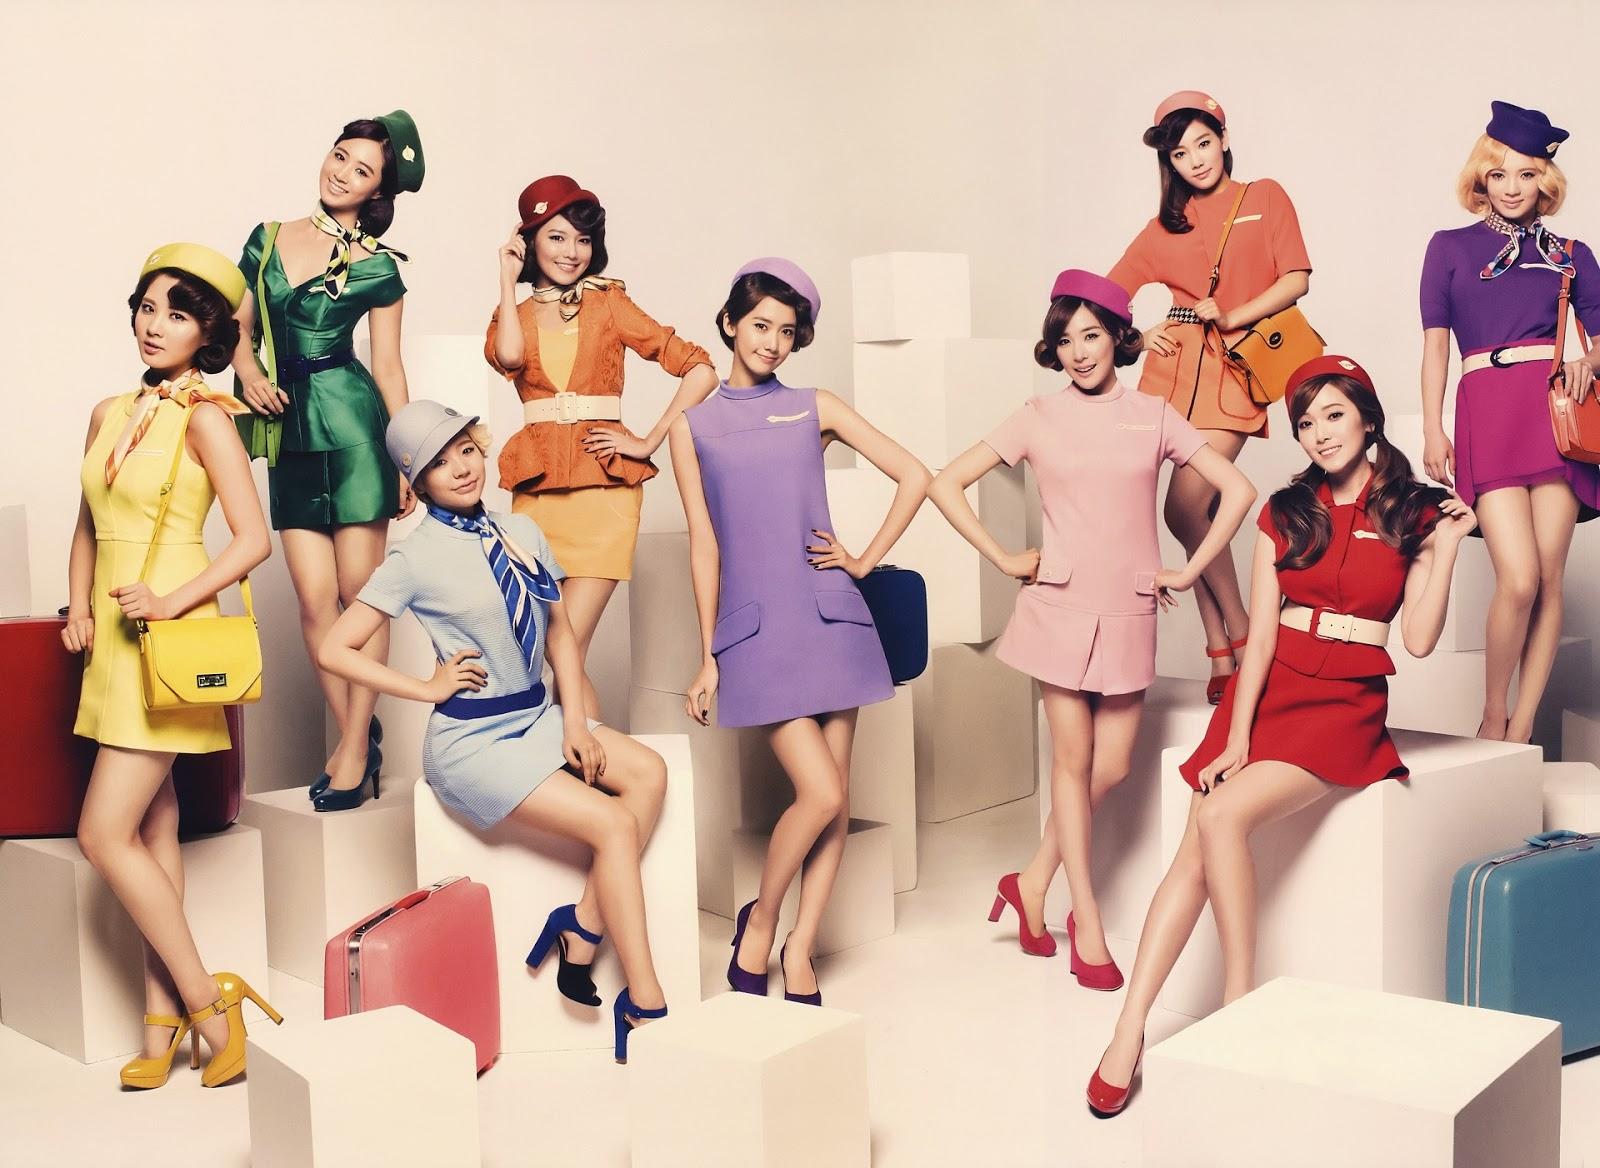 SNSD Girls Generation Girls & Peace Japan 2nd Tour Wallpaper HD